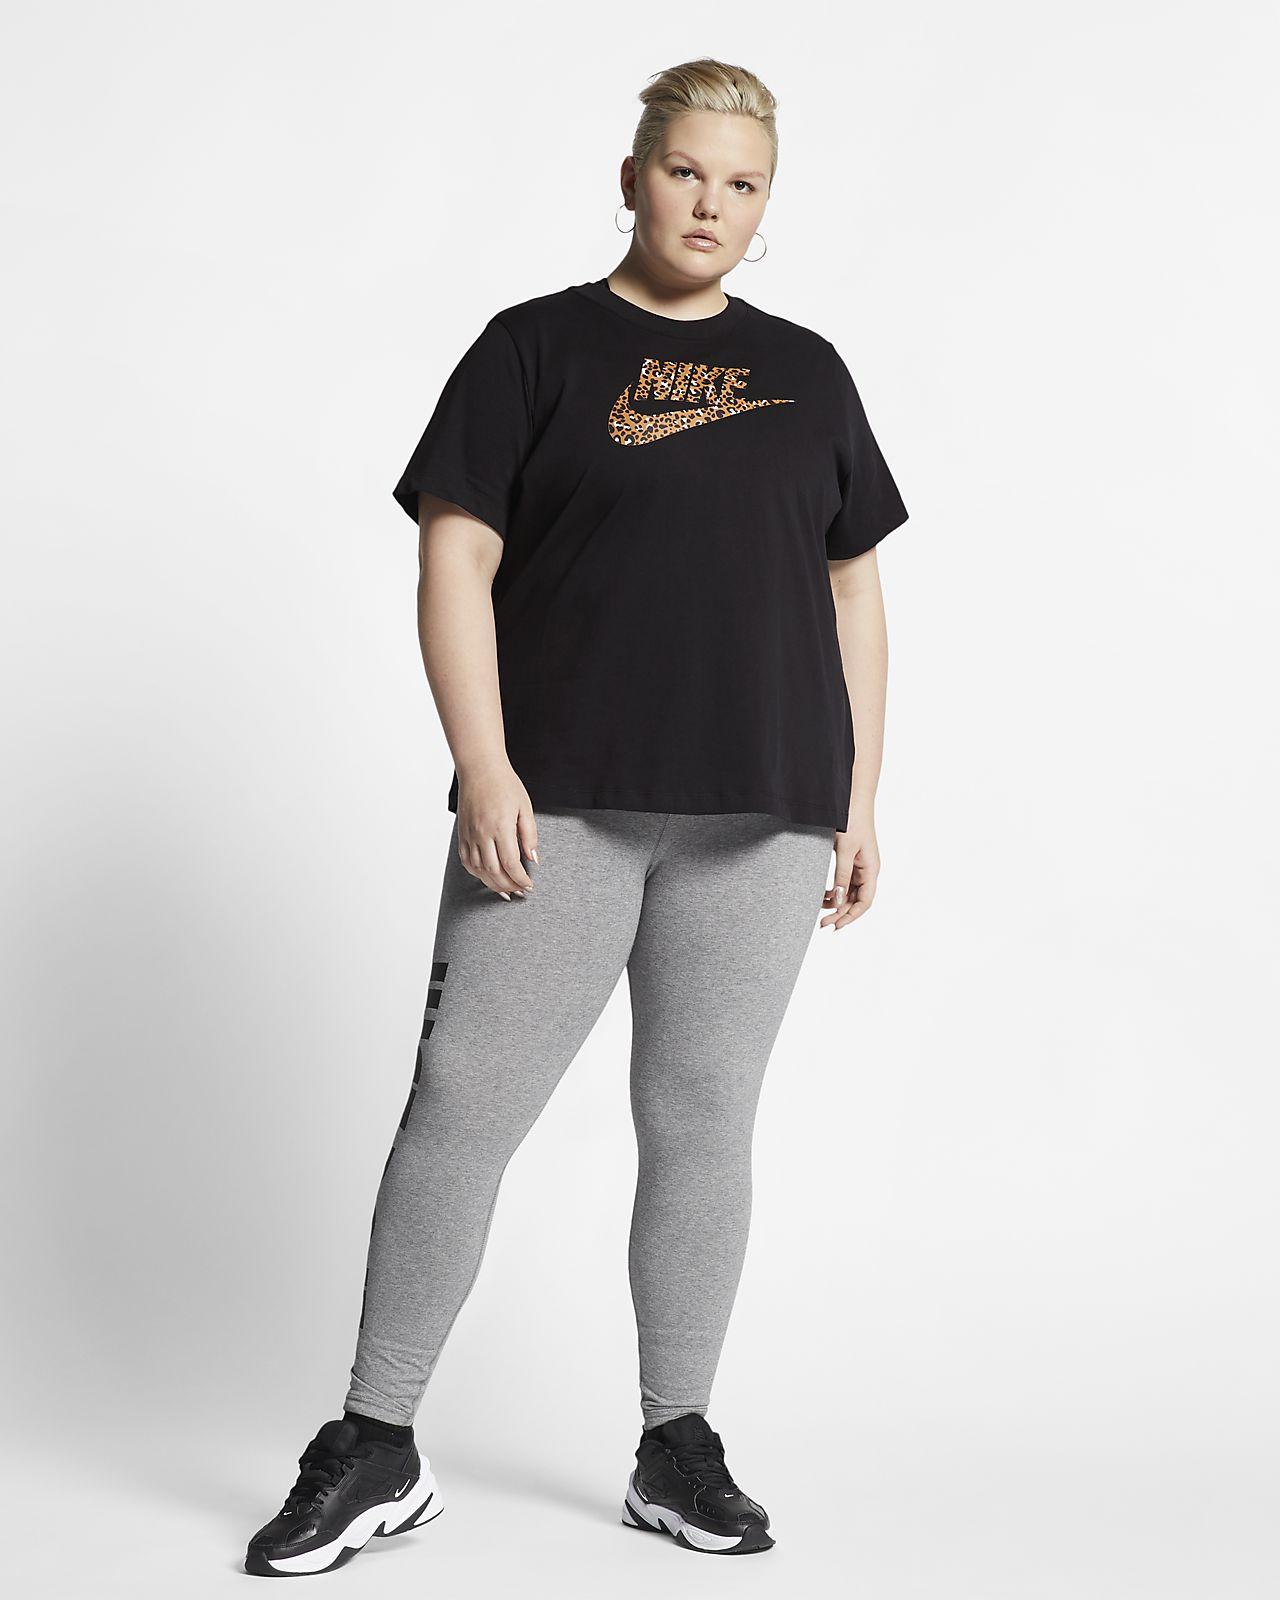 Nike Sportswear Animal Print Women's Short-Sleeve Top (Plus Size)